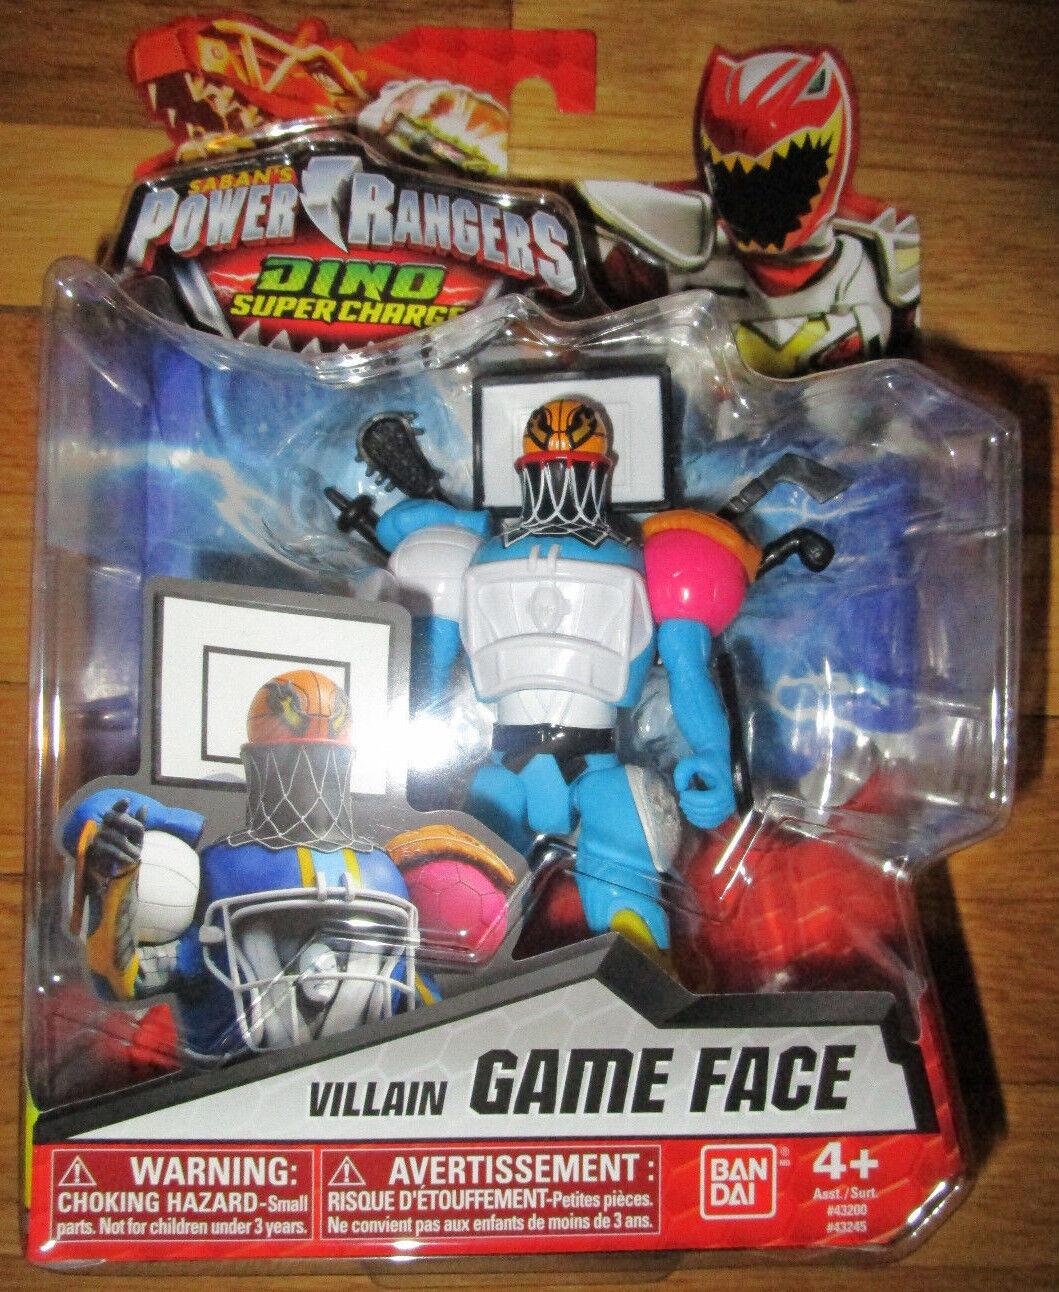 POWER RANGERS DINO SUPERCHARGE VILLAIN GAME FACE FIGURE 43245